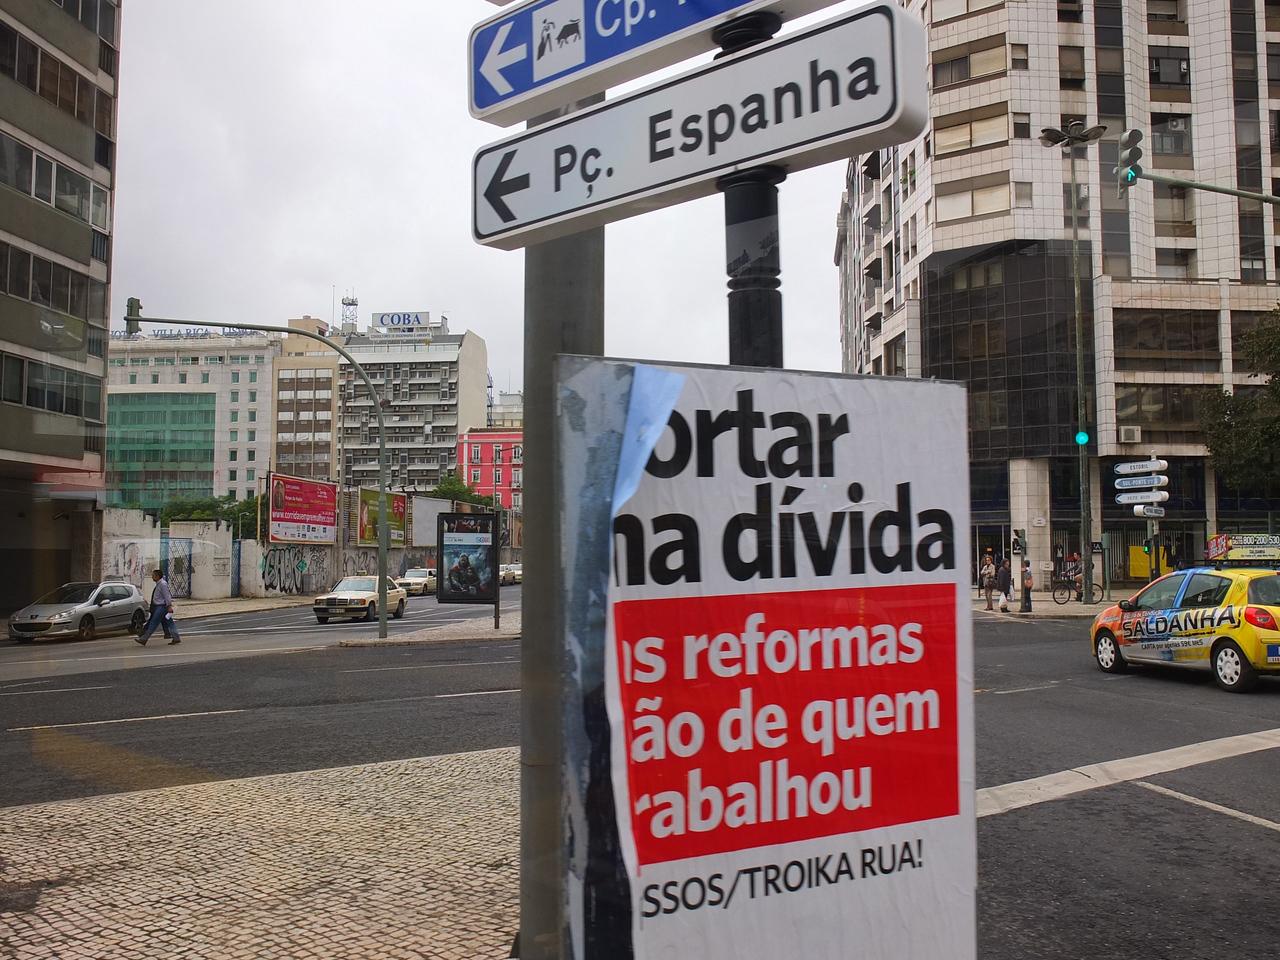 Driving through Lisbon